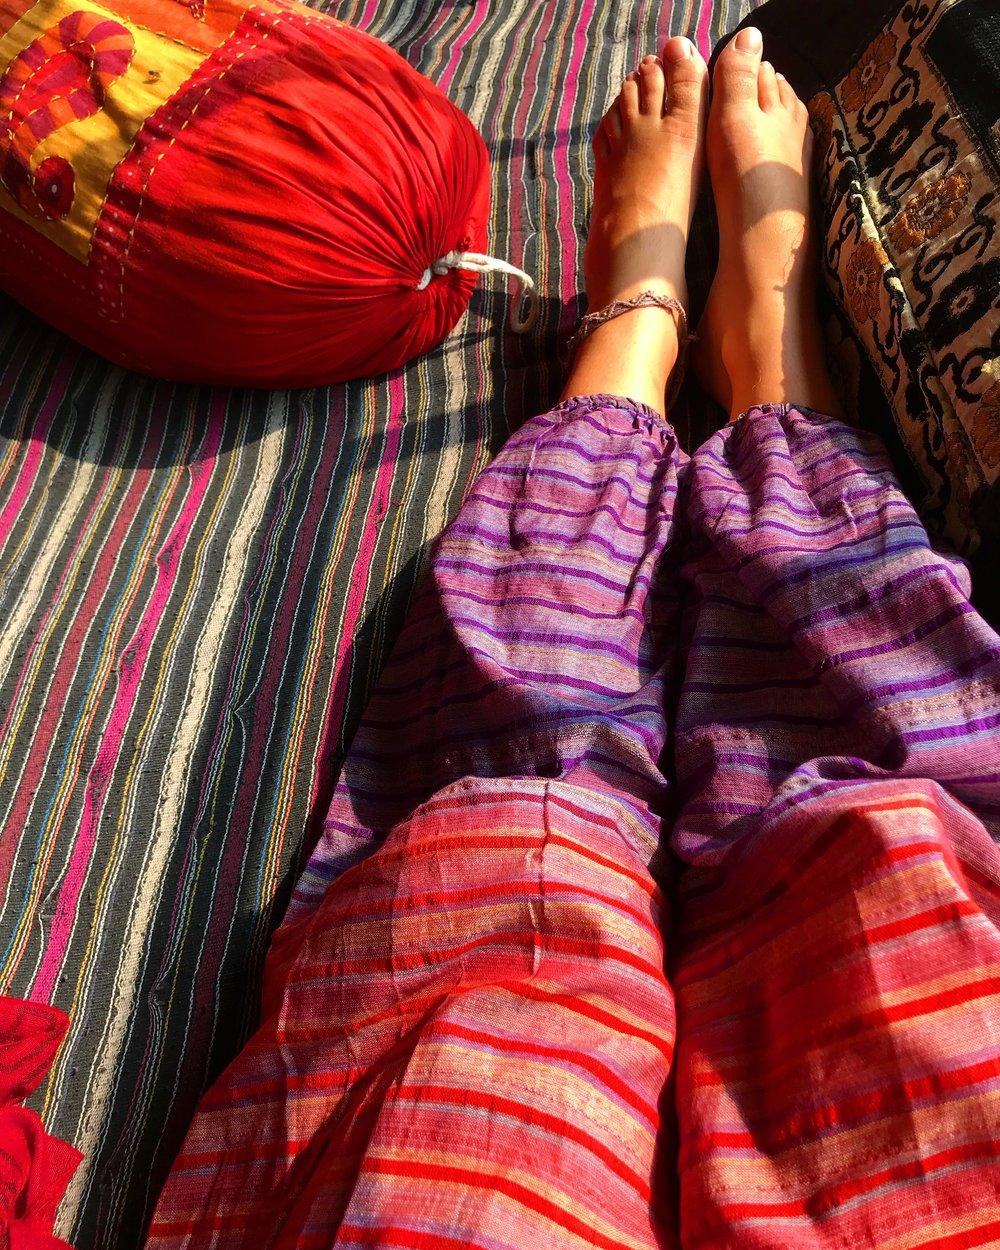 My funky pants matching the boho style blankets at Shambala Cafe.